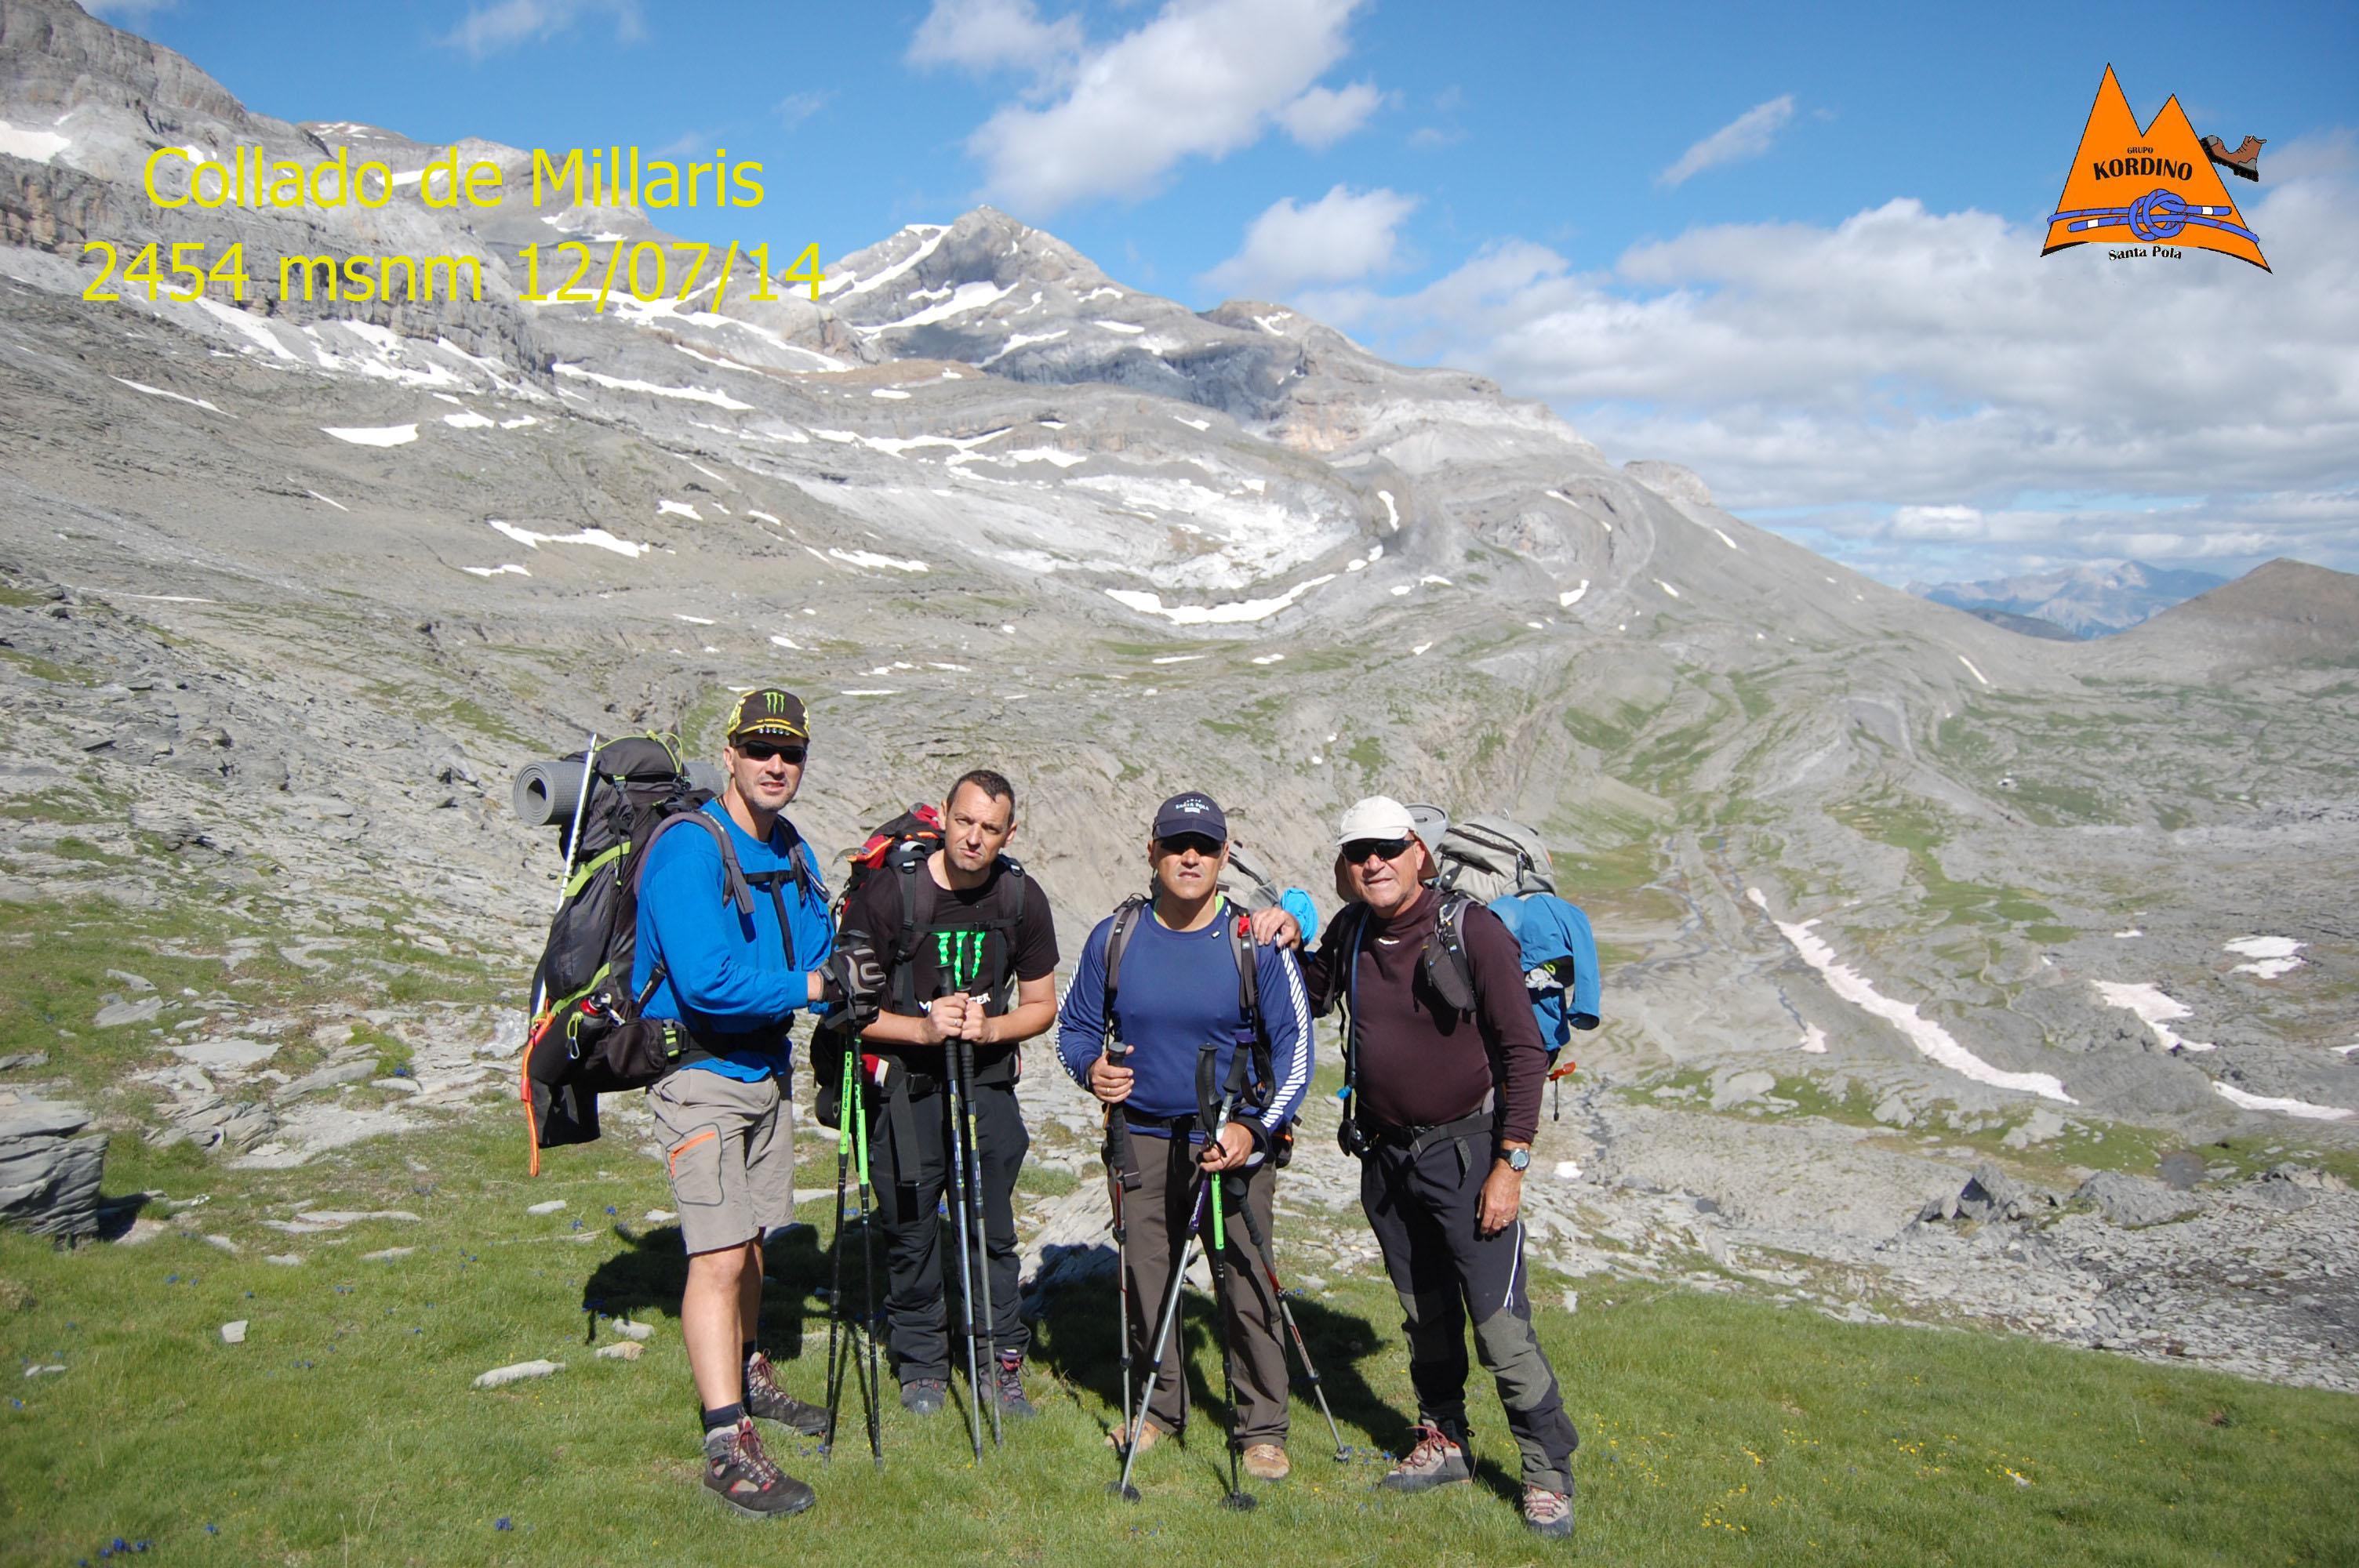 Collado Millaris 2454 msnm copia